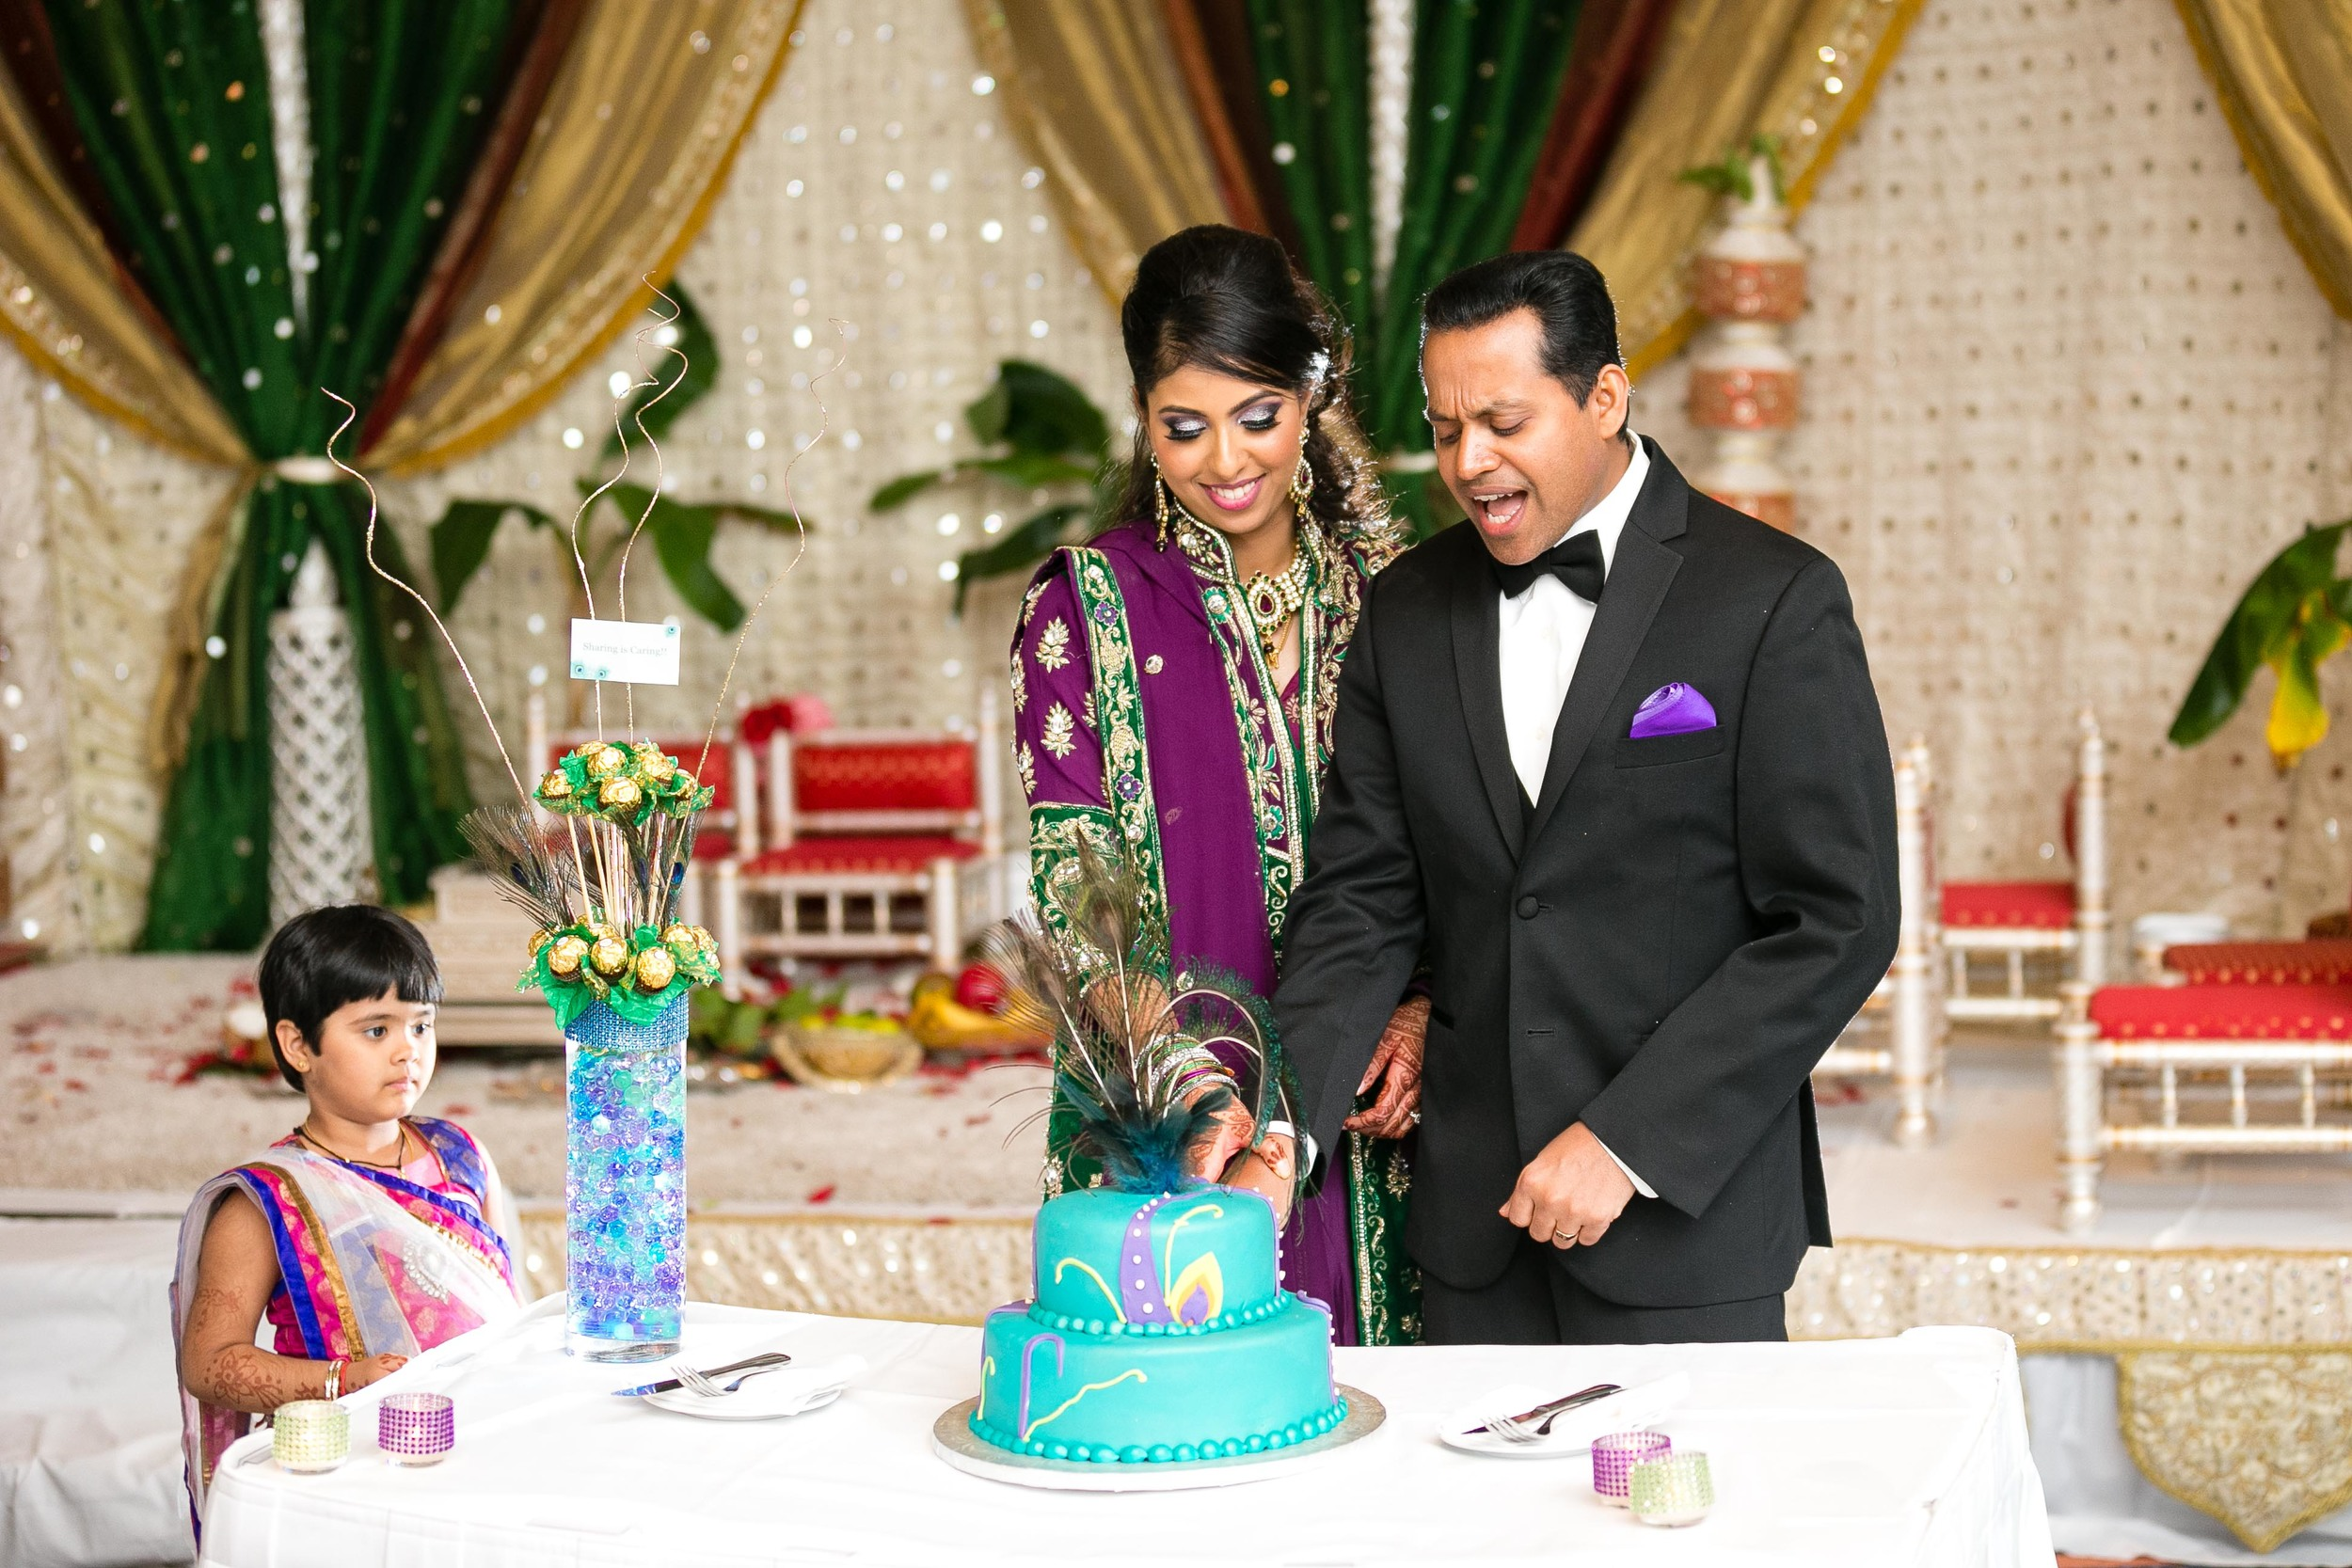 Luxurious-Indian-Wedding-Marriott-Boston-Massachusetts-Documentary-Wedding-Photography-by-Jacek-Dolata-43.jpg